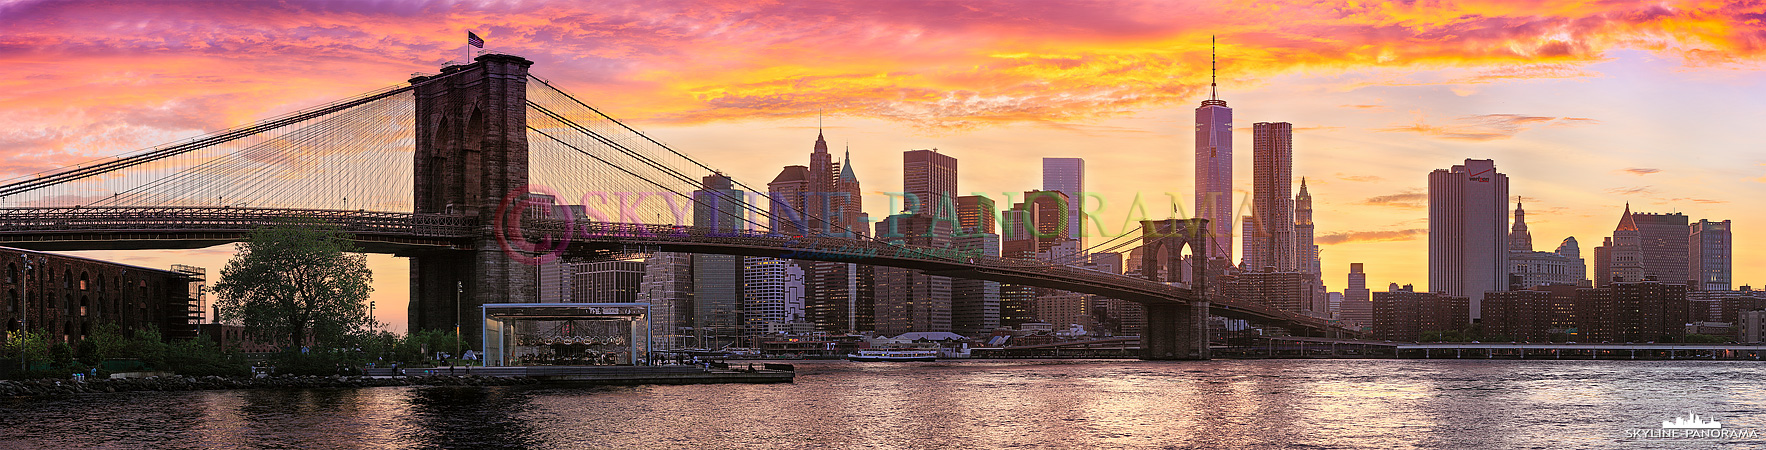 Skyline New York zum Sonnenuntergang